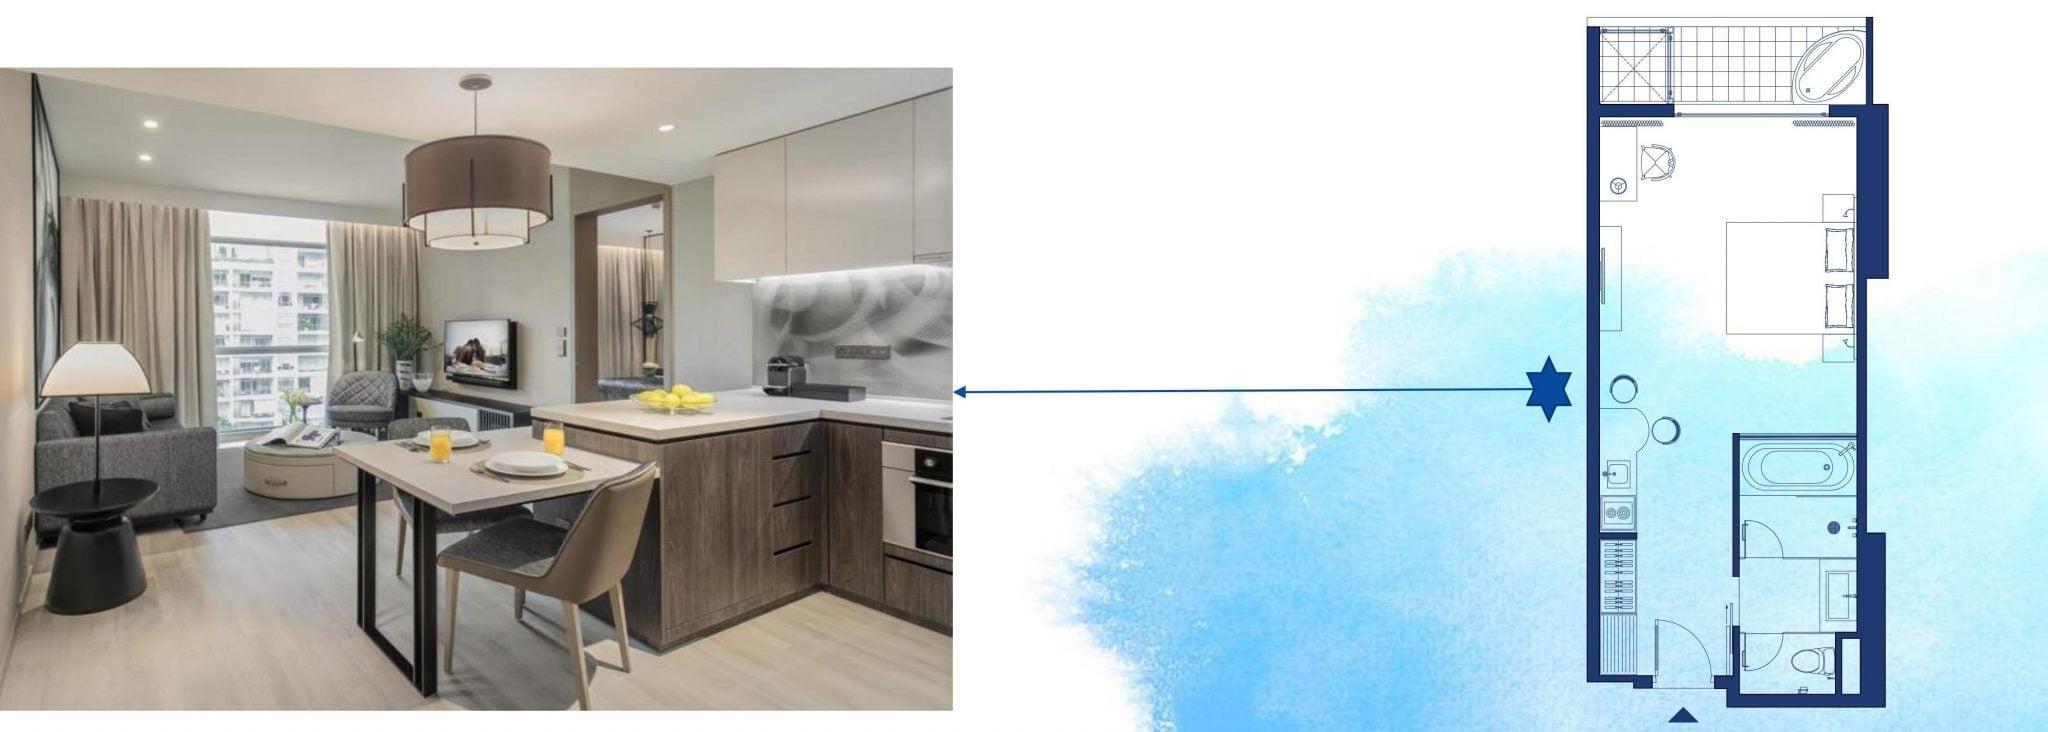 0042 e1563265271392 - Dự án căn hộ condotel Cam Ranh Bay - Pearl Cam Ranh